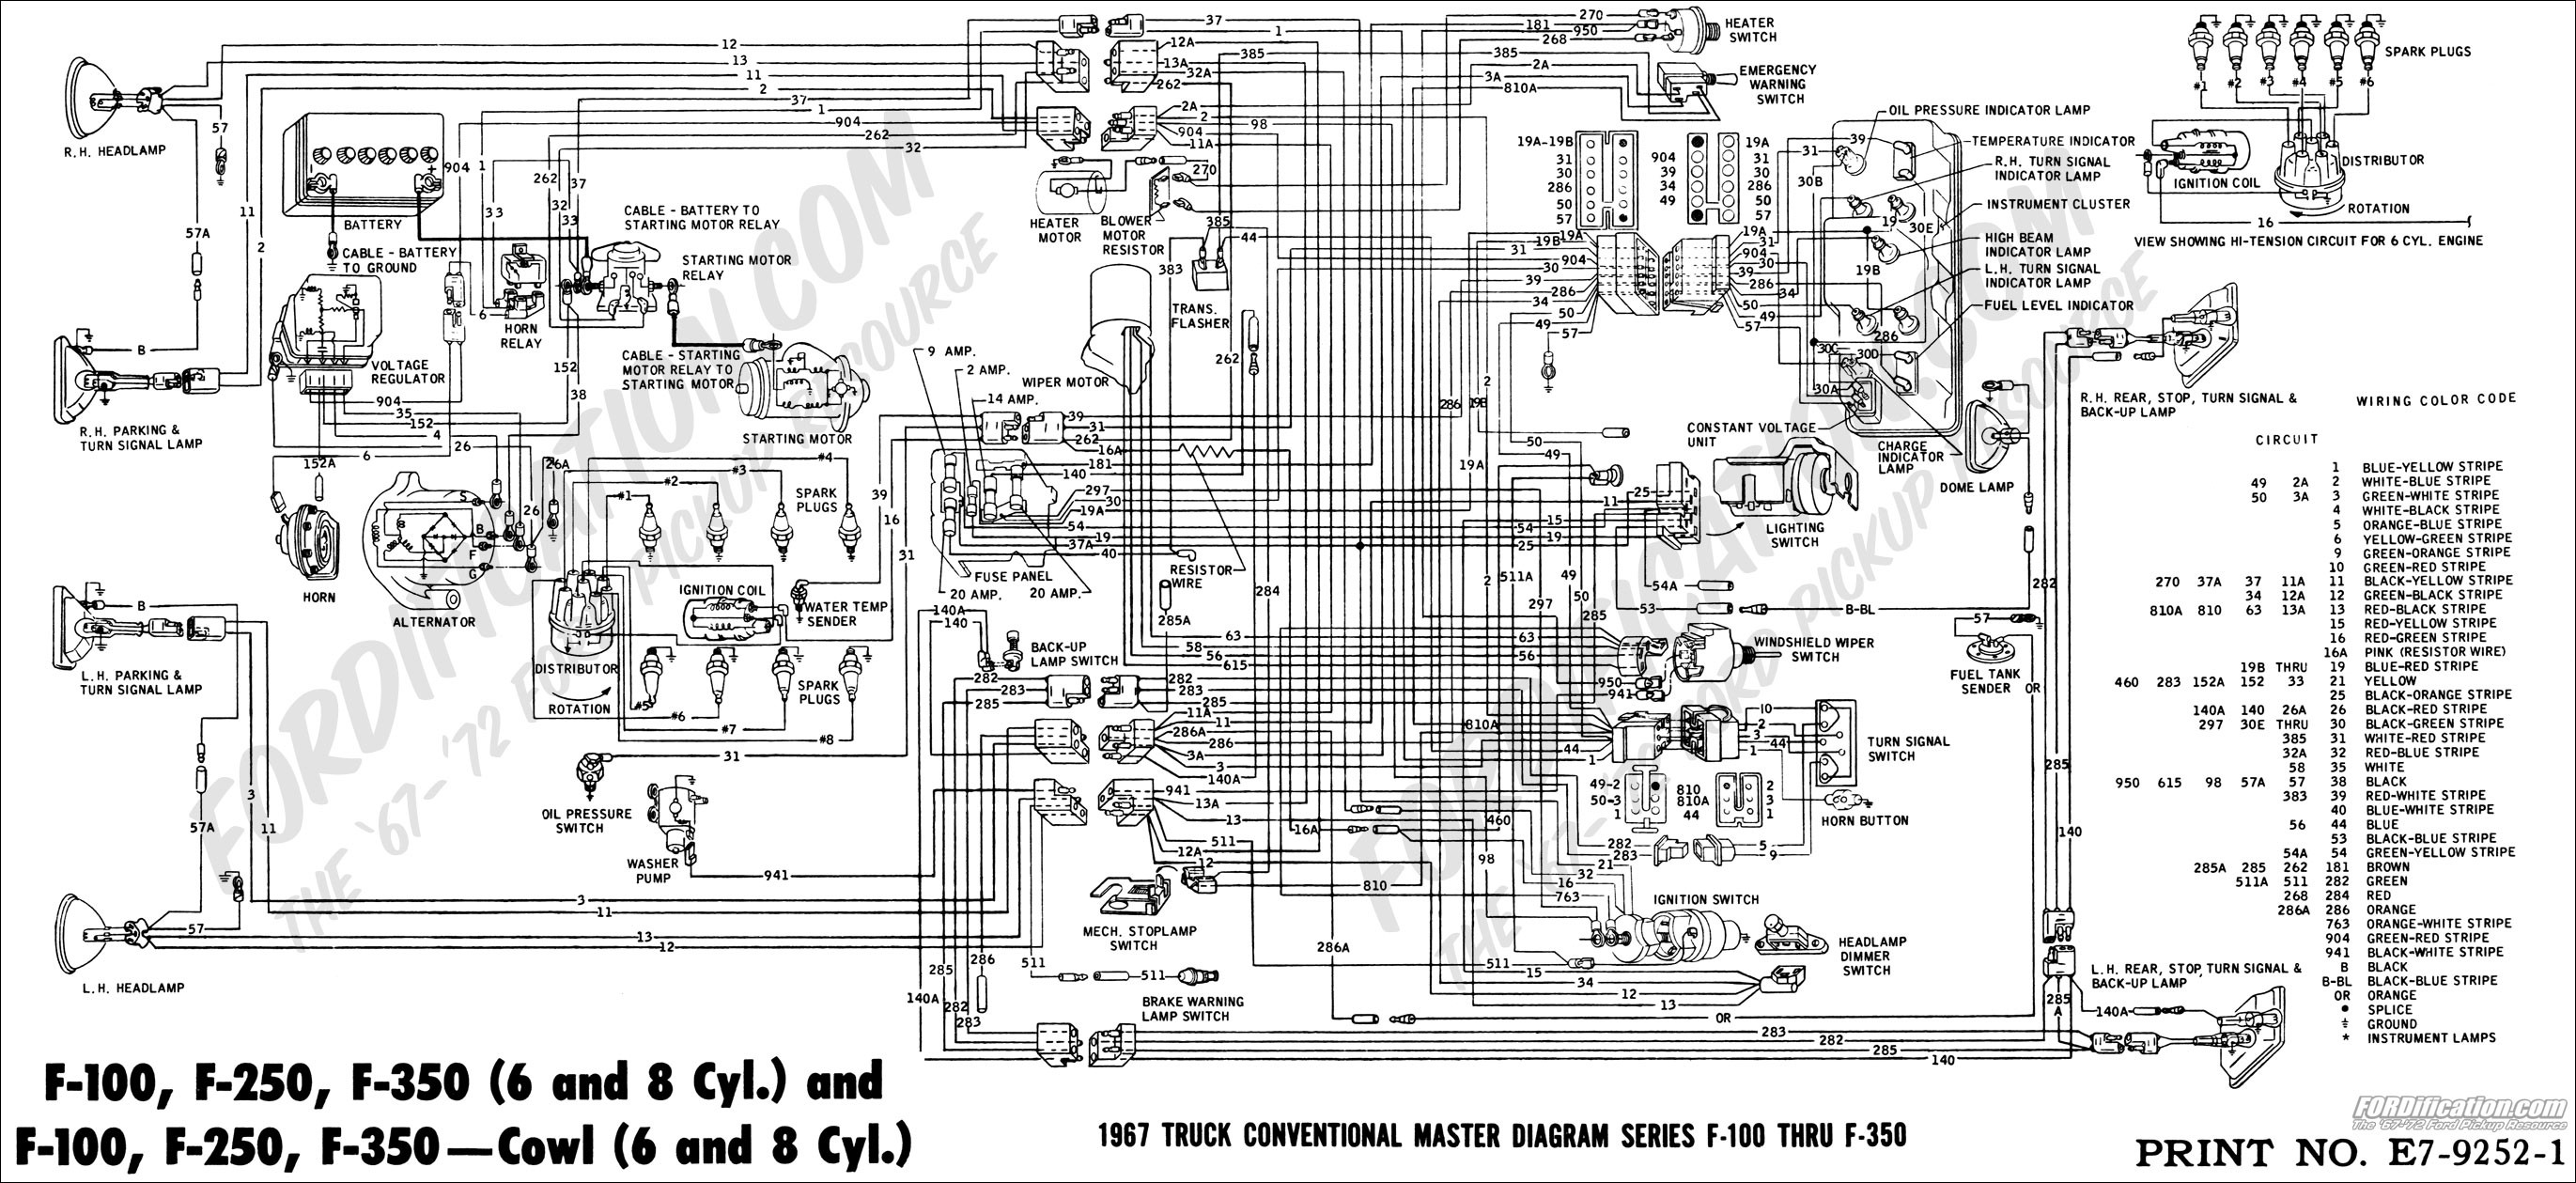 2004 ford Ranger Wiring Diagram 2007 ford Ranger Wiring Diagram Canopi Of 2004 ford Ranger Wiring Diagram